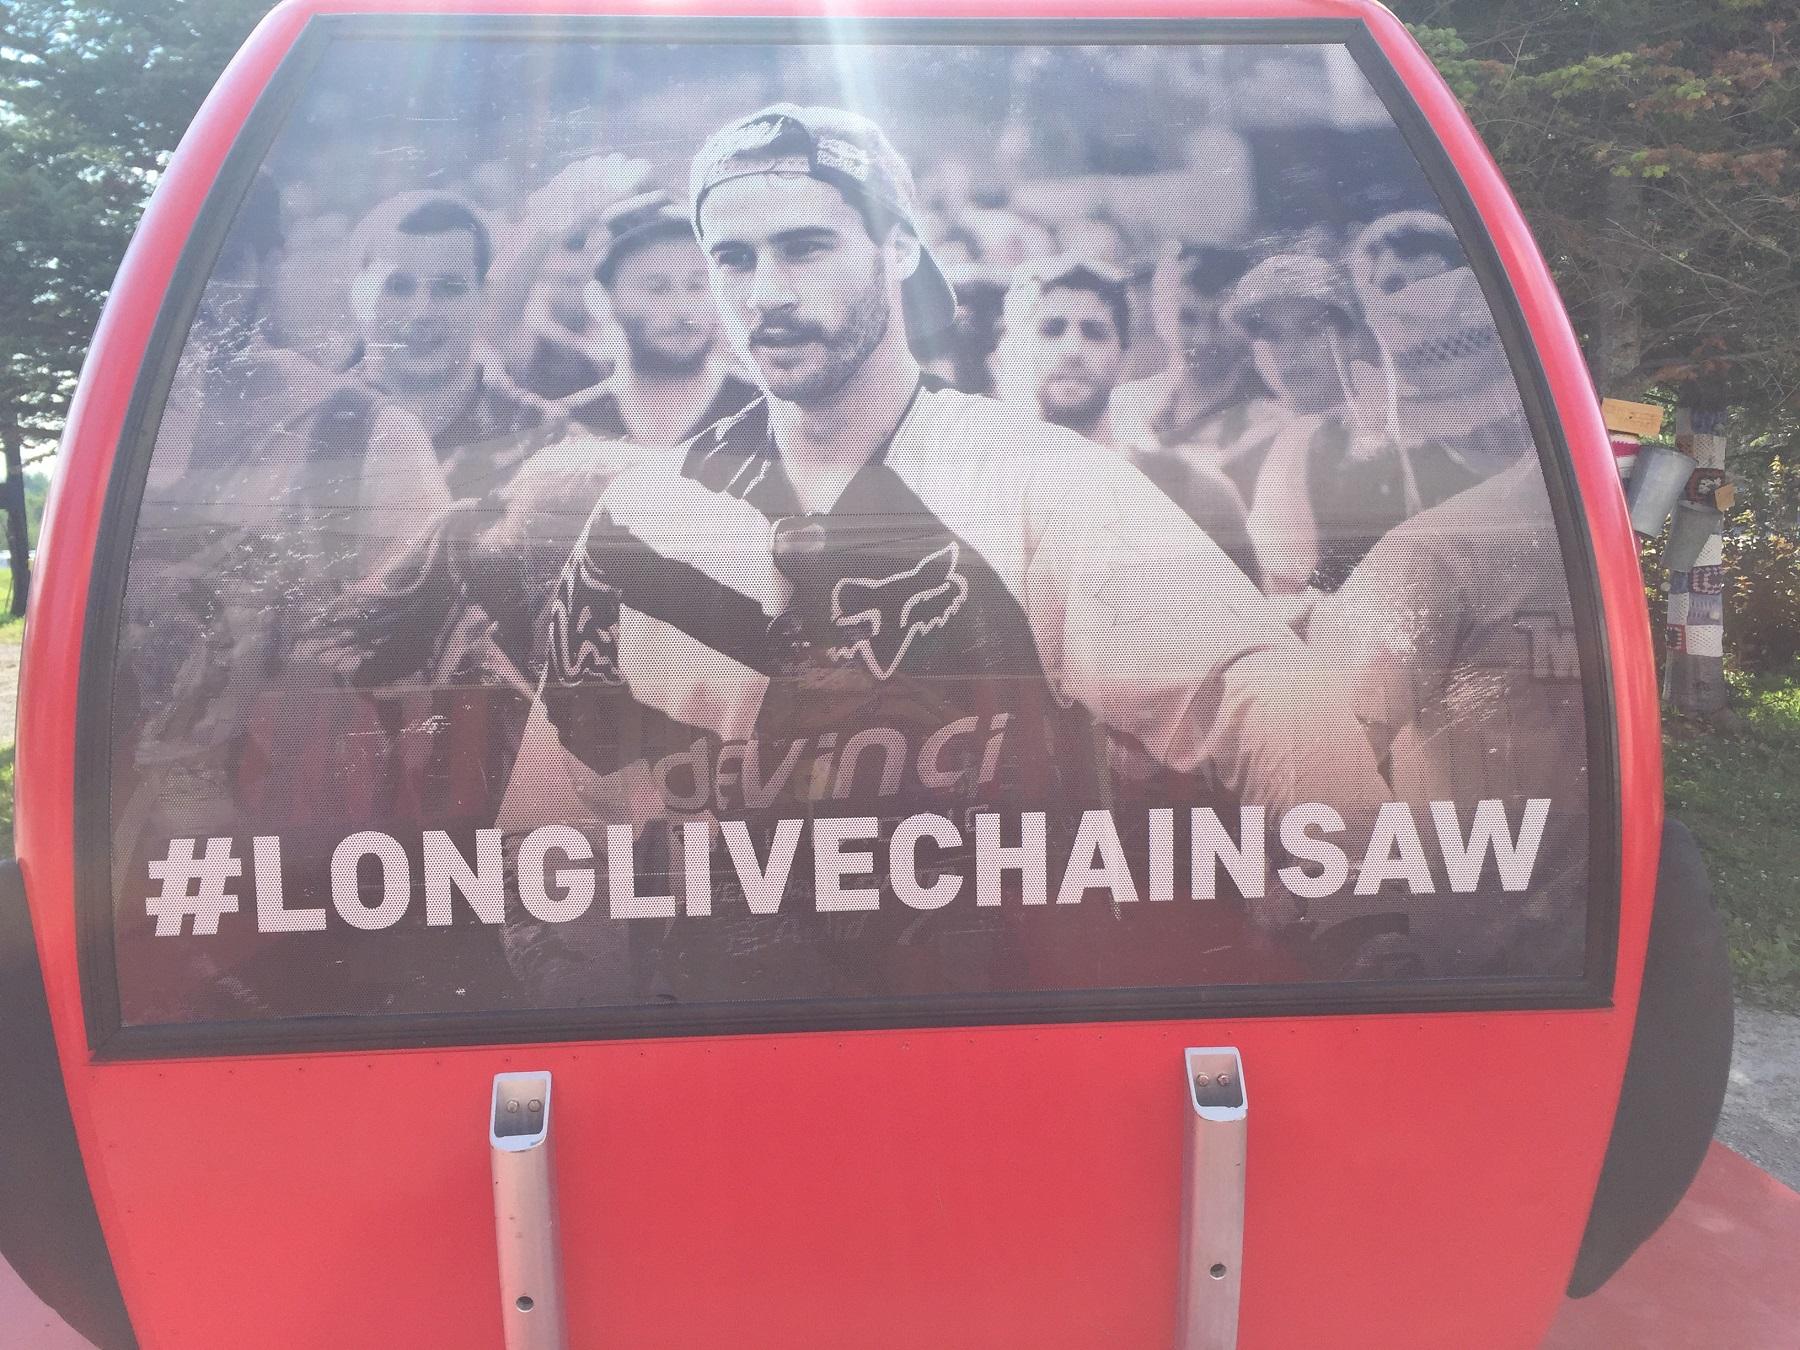 Long Live Chainsaw Teaser - Anthill Films - Stevie Smith, Long Live Chainsaw Teaser – Anthill Films – Stevie Smith